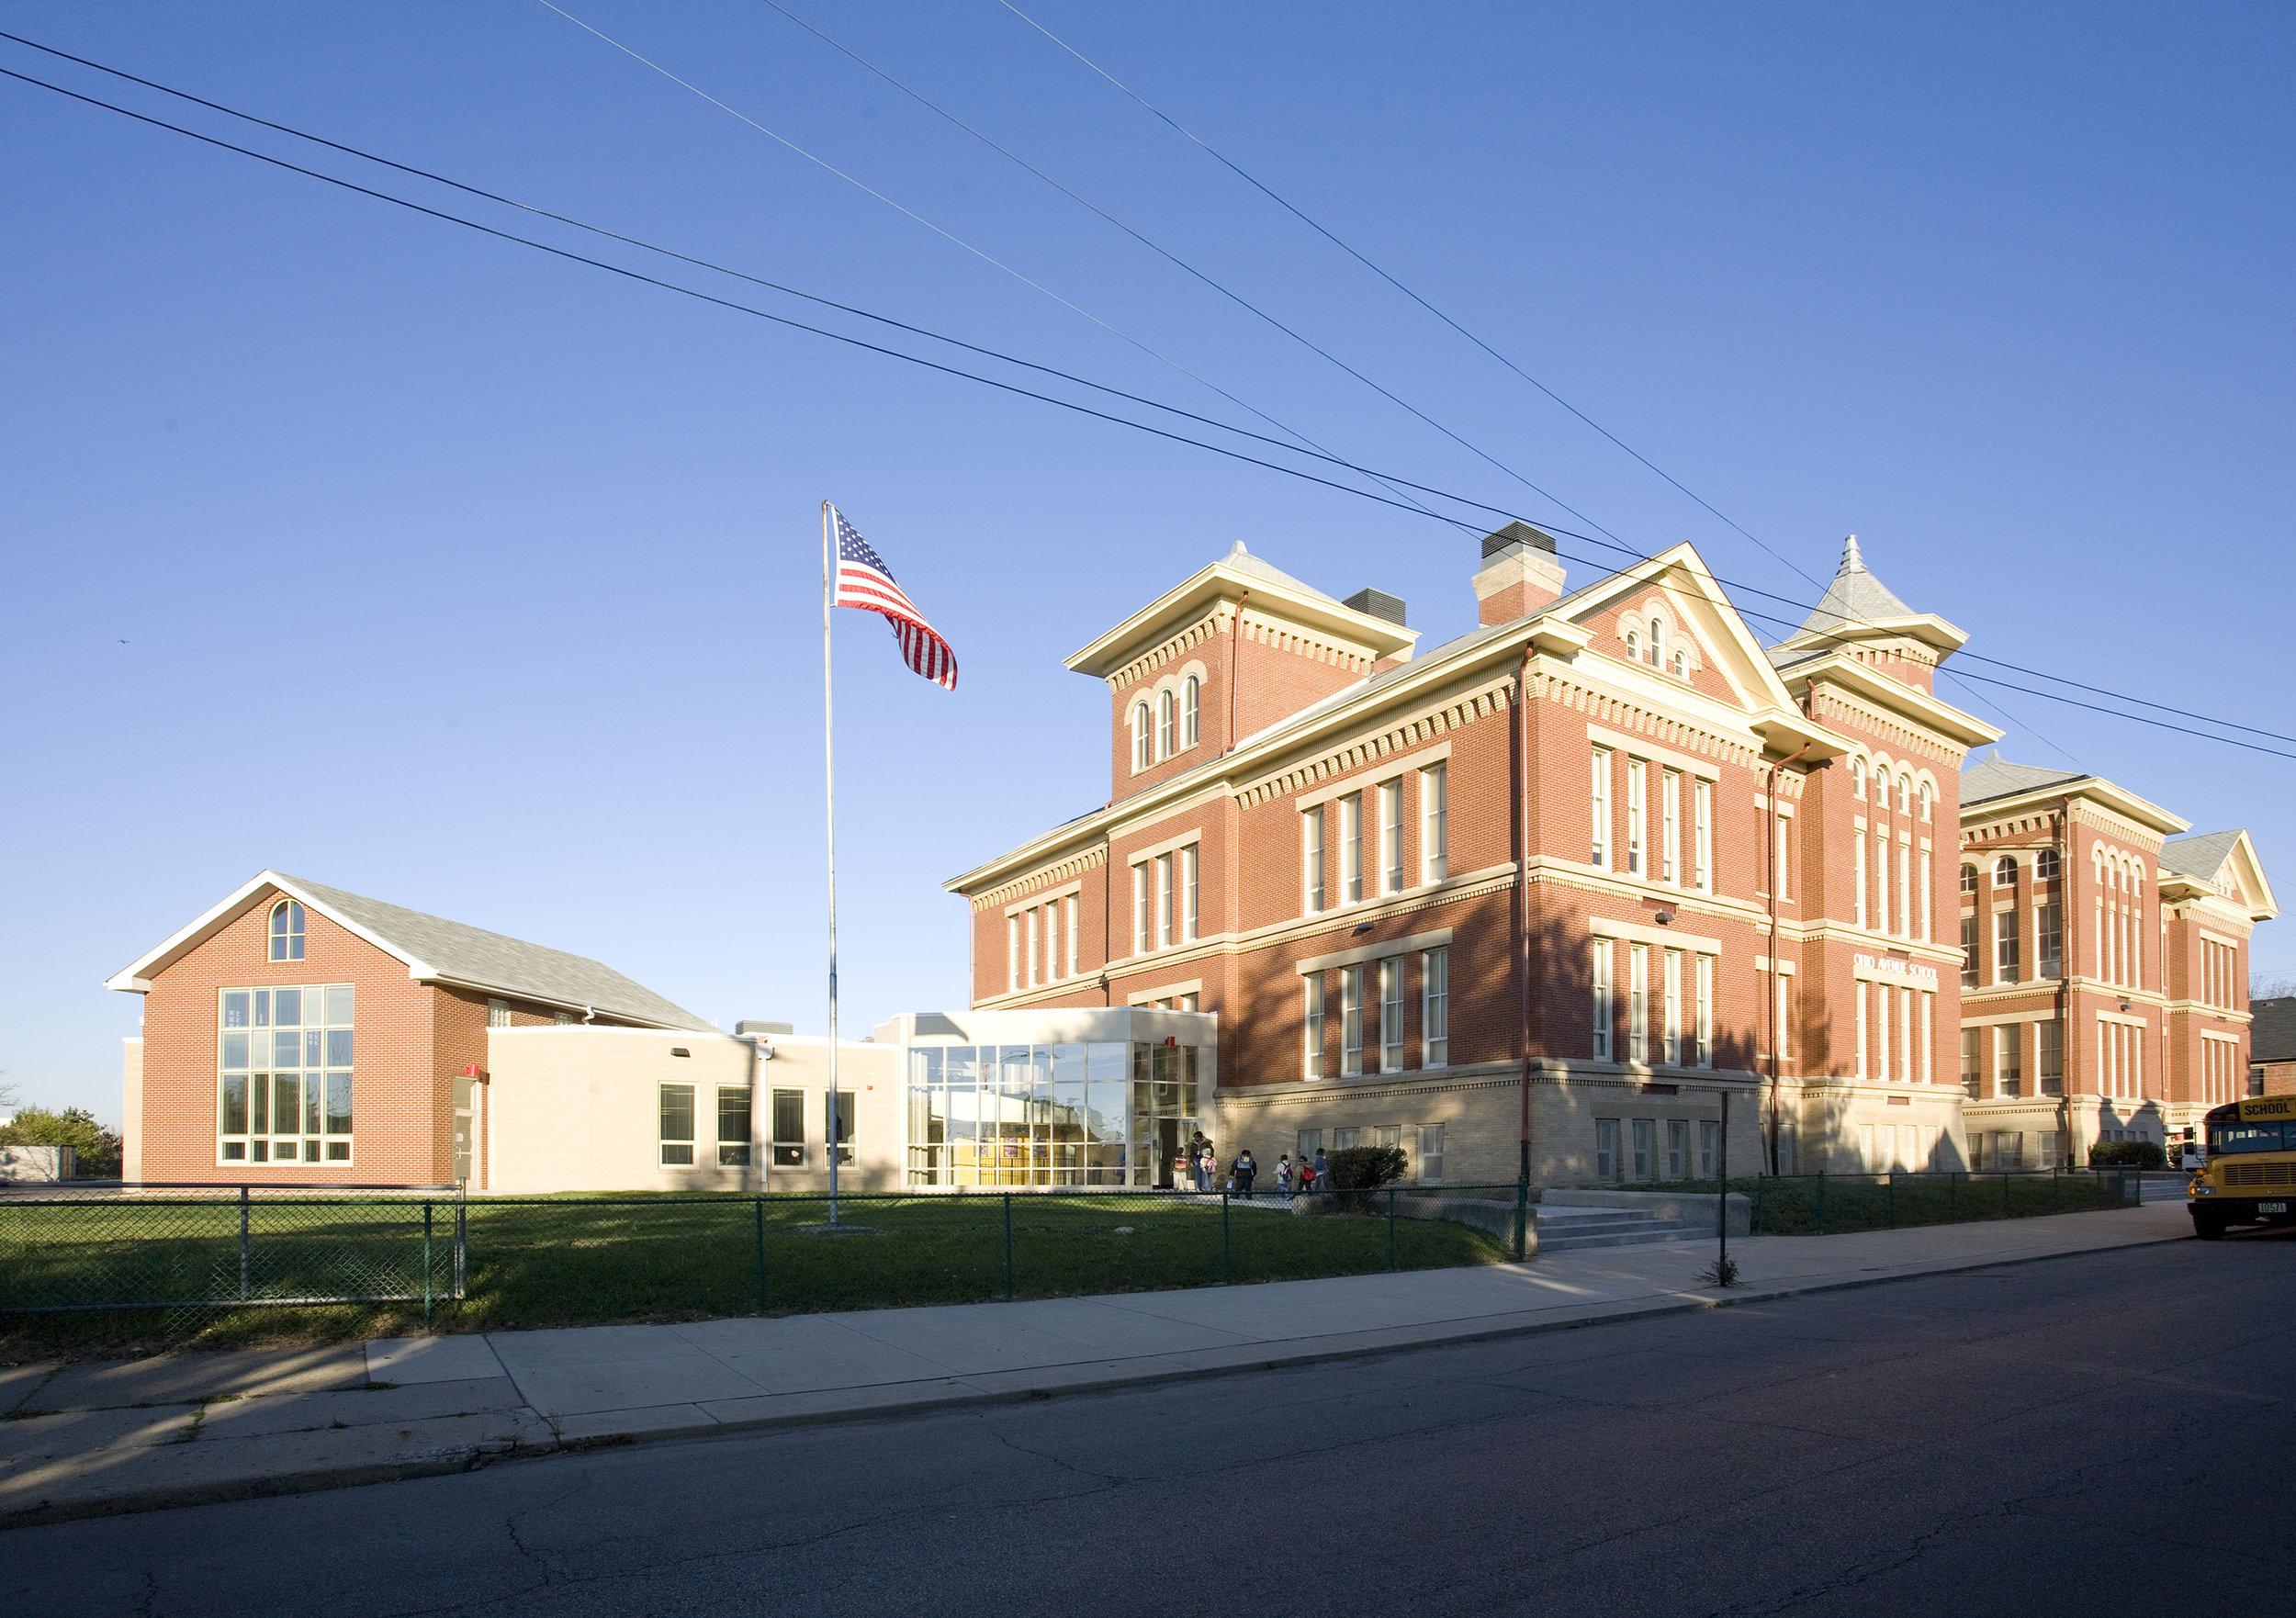 OHIO AVENUE ELEMENTARY SCHOOL - COLUMBUS, OH